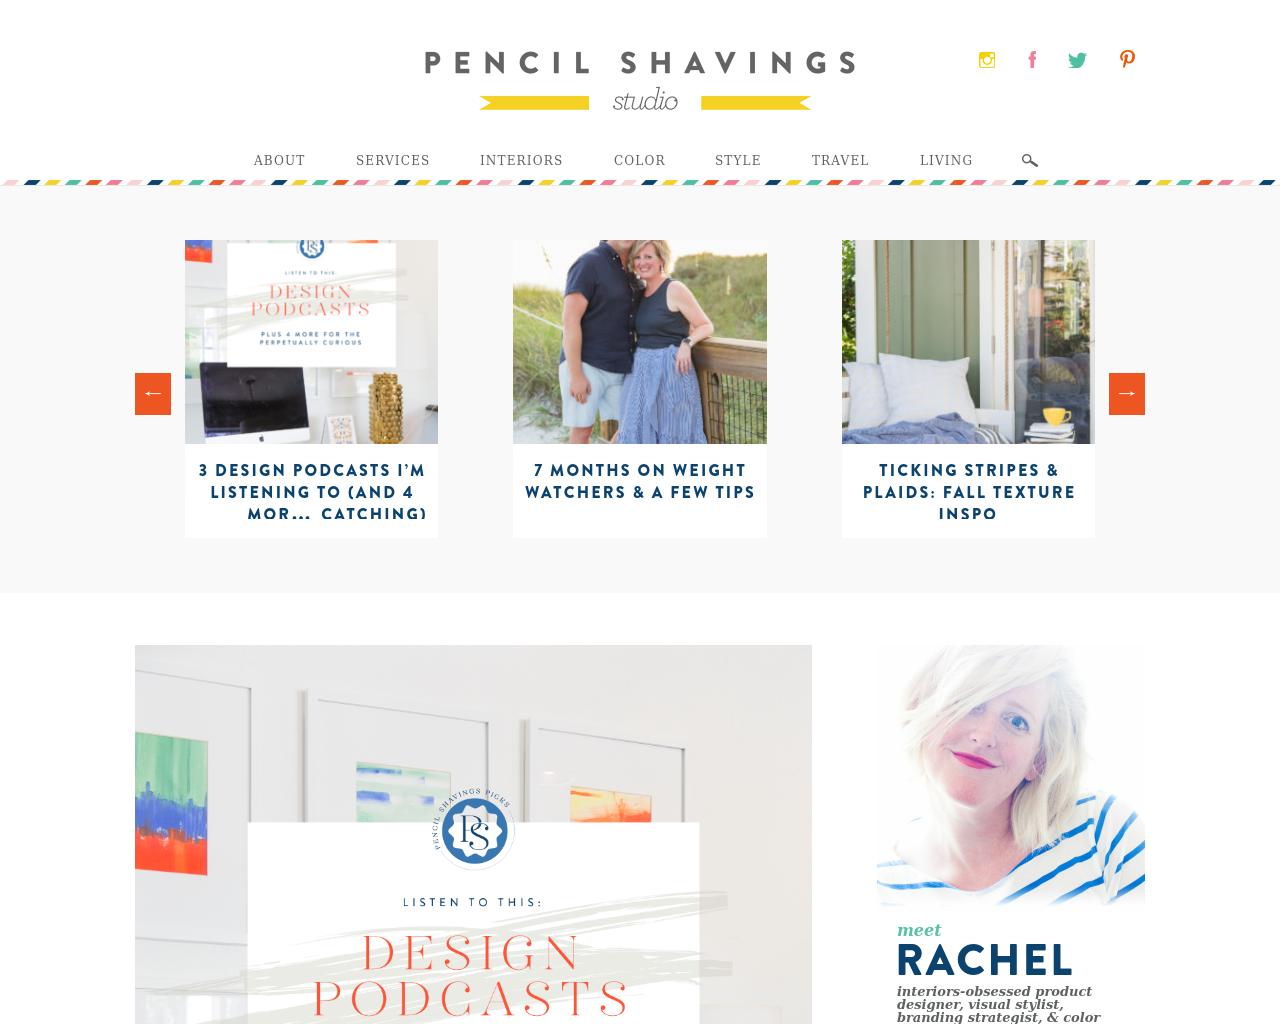 Pencil-Shavings-Studio-Advertising-Reviews-Pricing